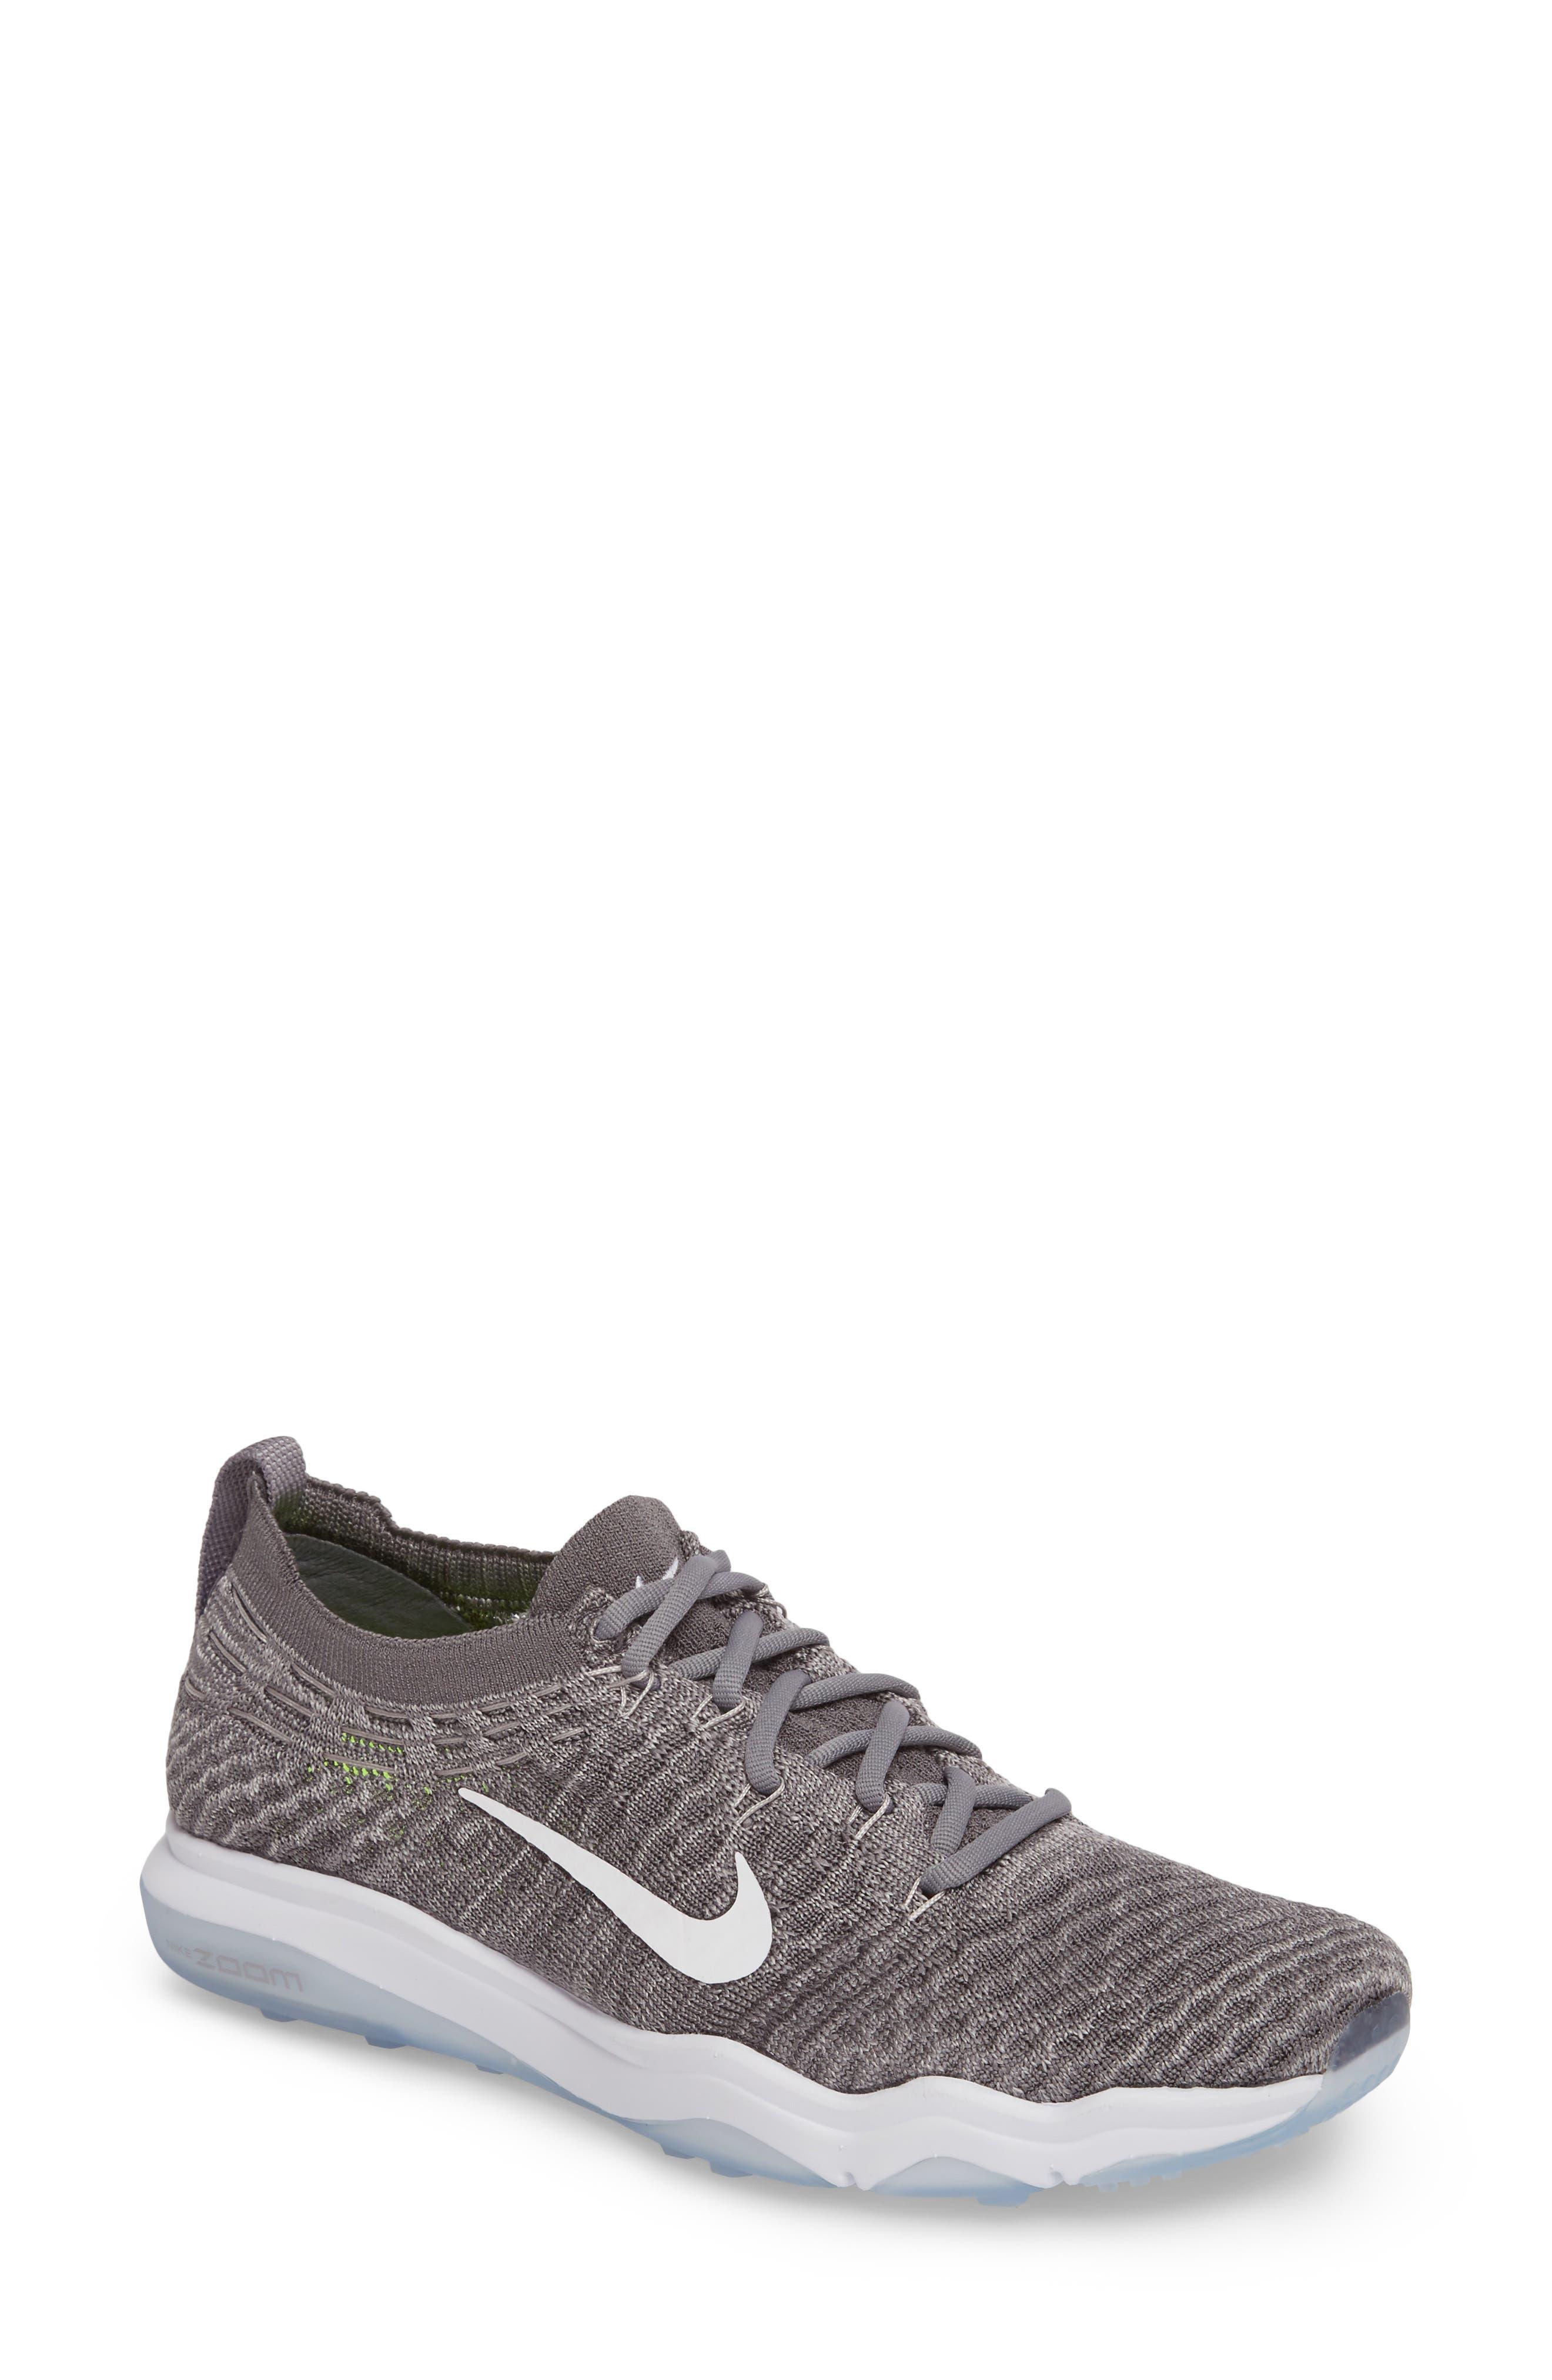 Main Image - Nike Air Zoom Fearless Flyknit Lux Training Shoe (Women)